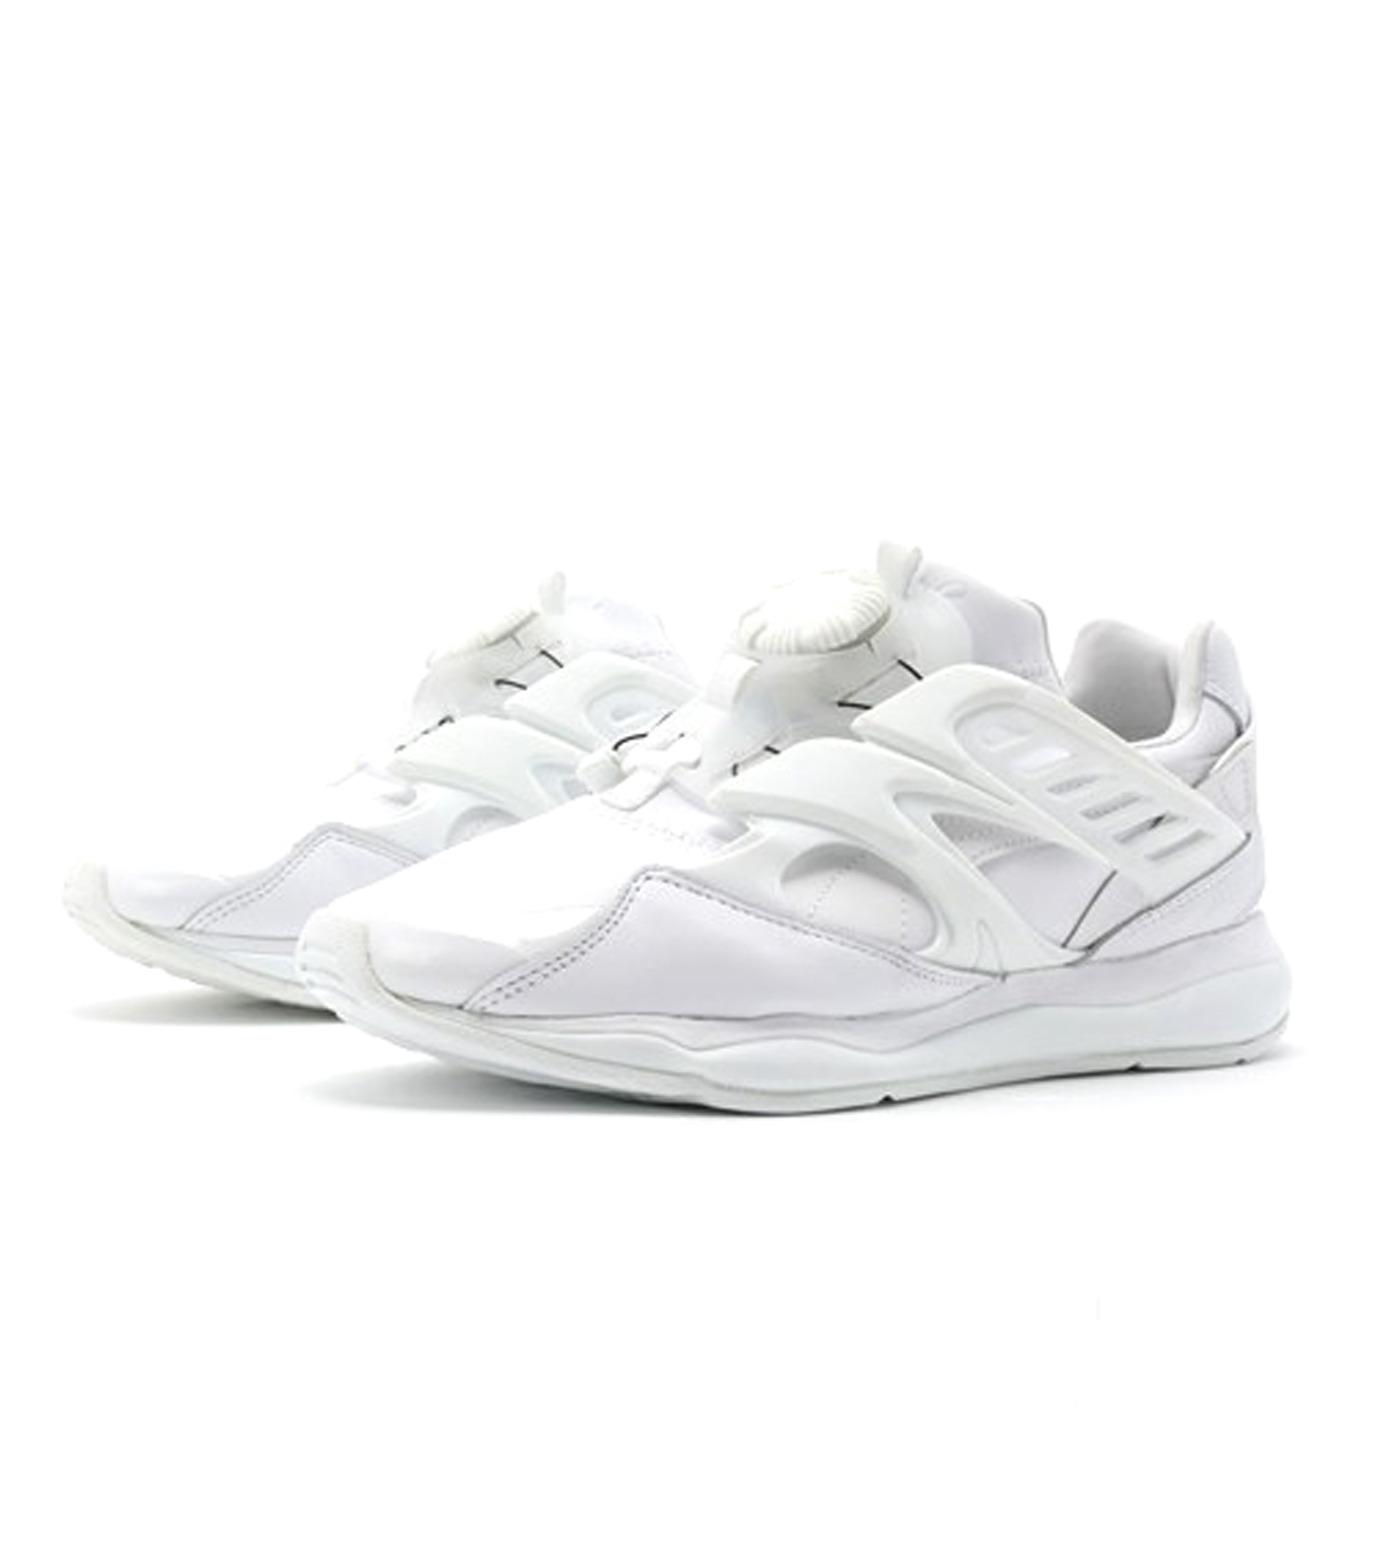 PUMA(プーマ)のDISC BLAZE CELL-WHITE(シューズ/shoes)-360078-4 拡大詳細画像3